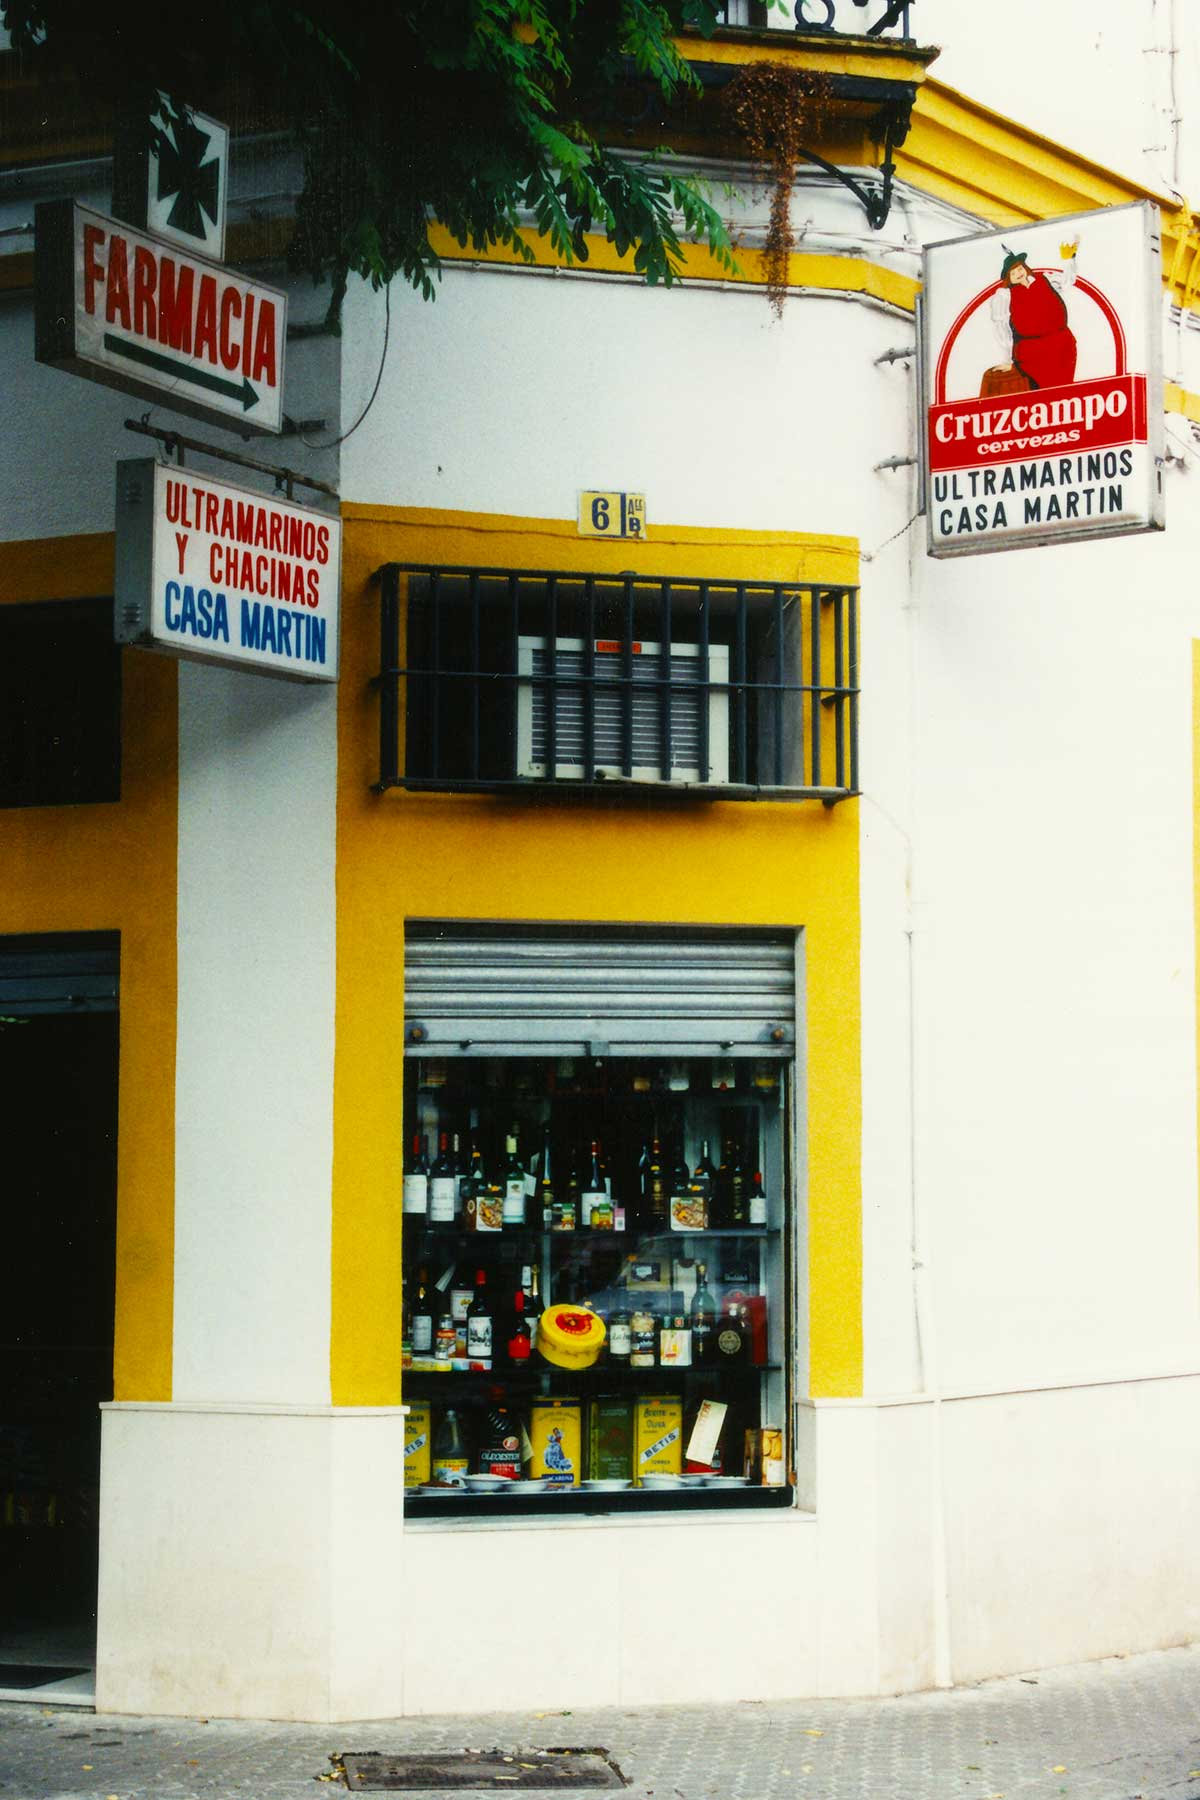 My Porvenir Apartment | Casa Martin | Seville Spain | Study Abroad Journal - Steven Andrew Martin - 1998